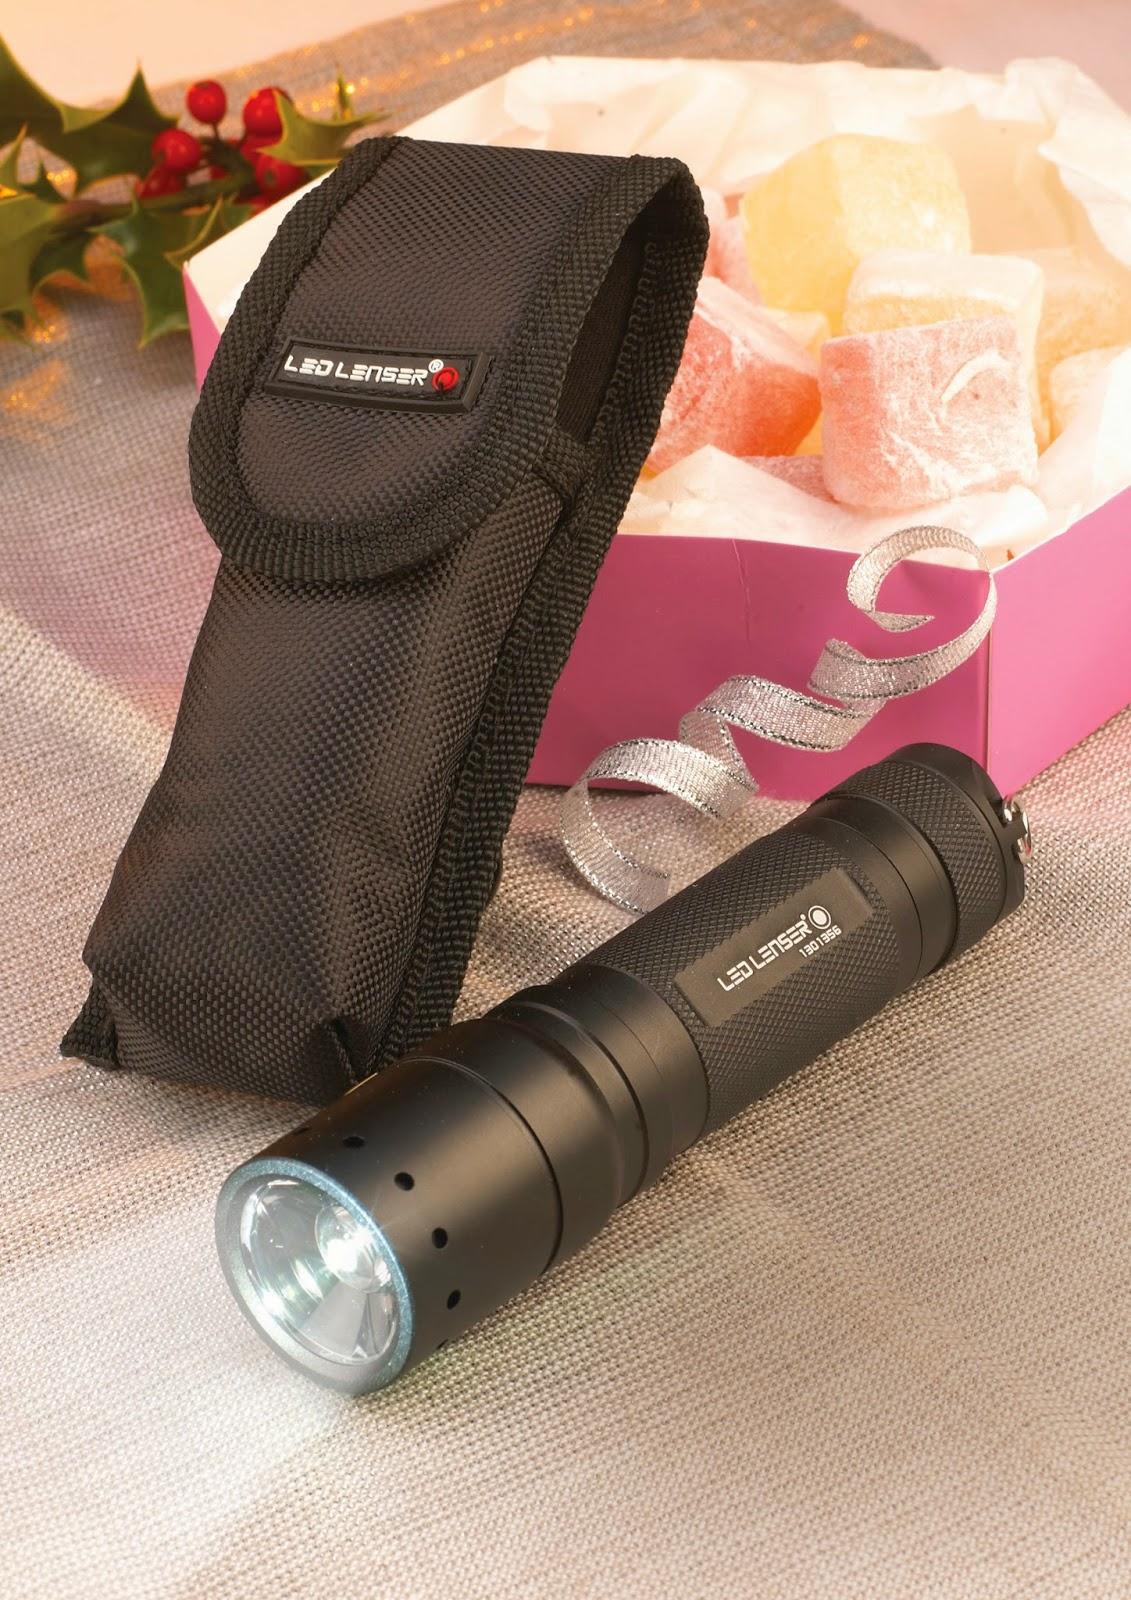 http://www.beesleyandfildes.co.uk/lighthouse-elite-3w-pocket-focus-torch-ref-xms13pocket/